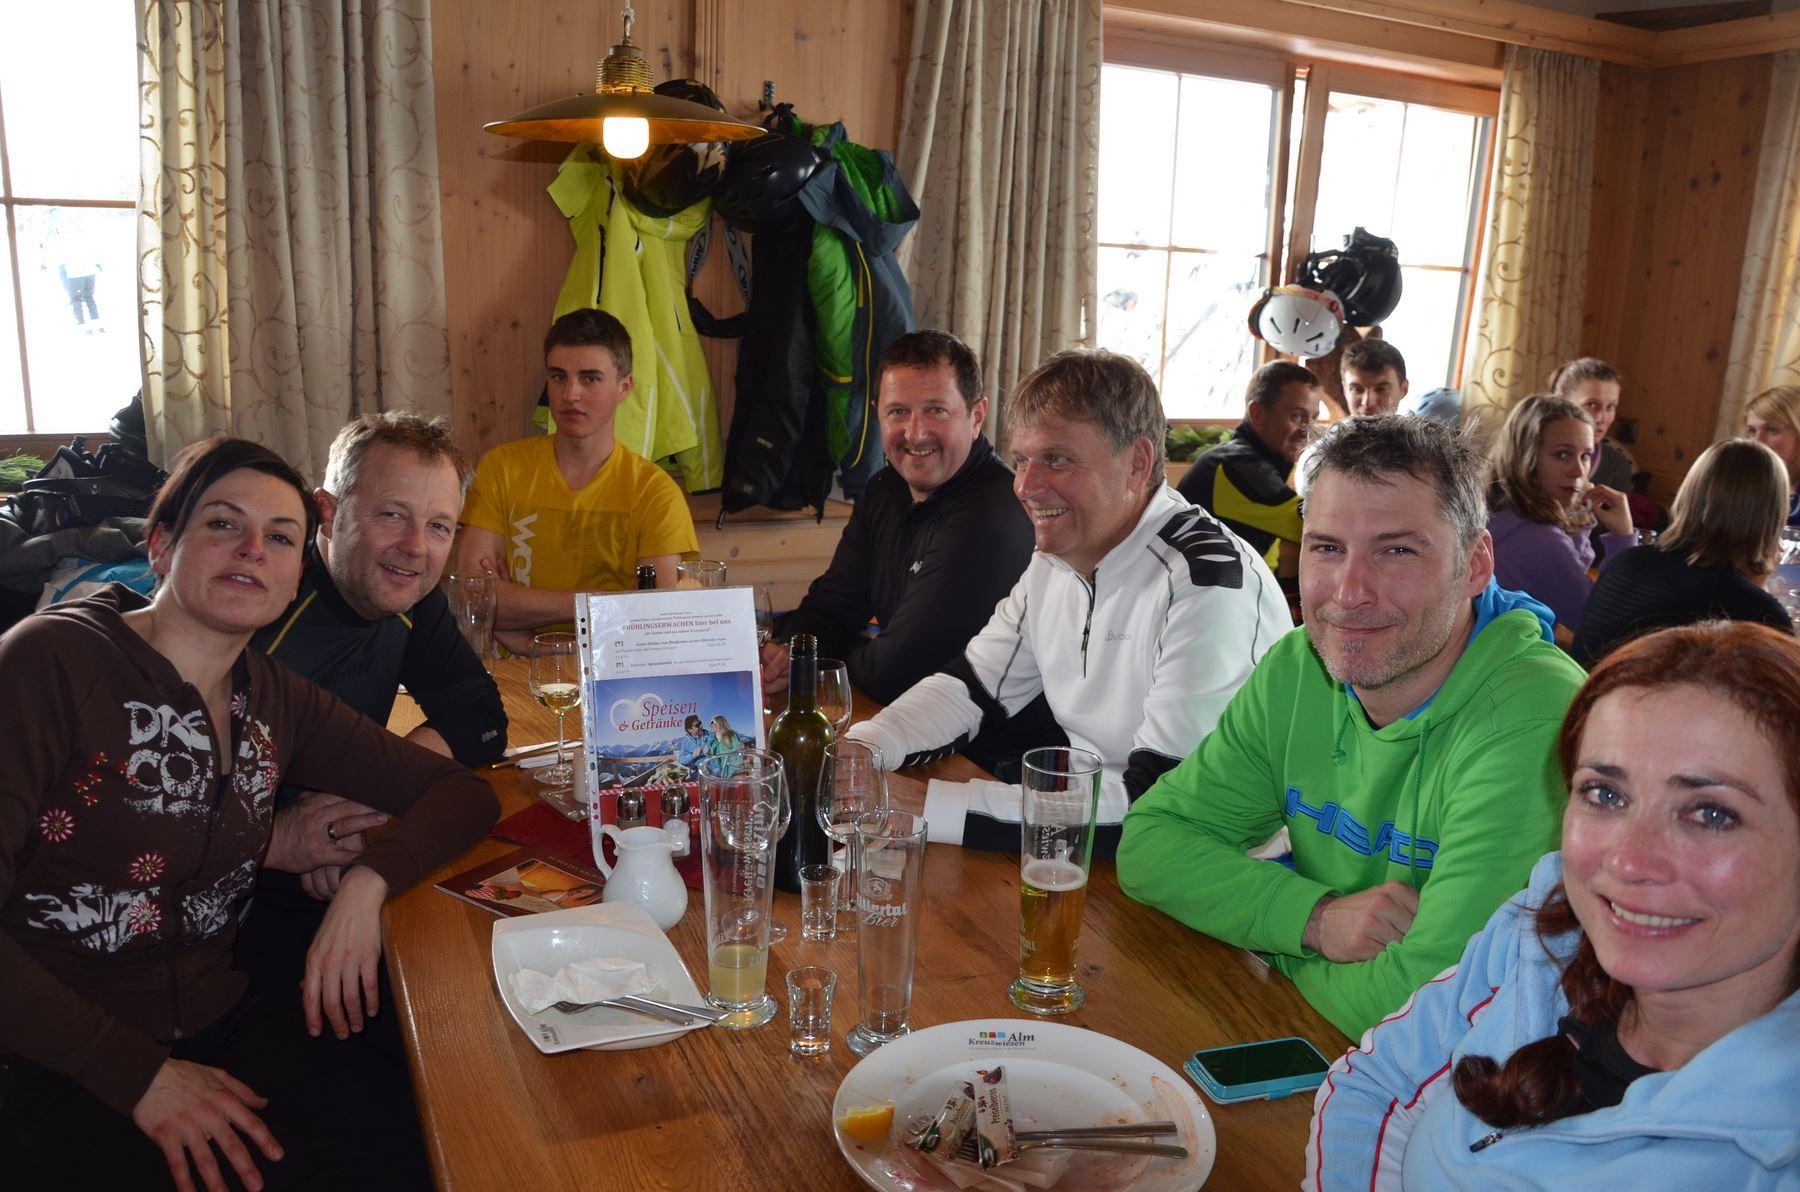 2015-03-22 BV Zillertal Skirennen 302.JPG